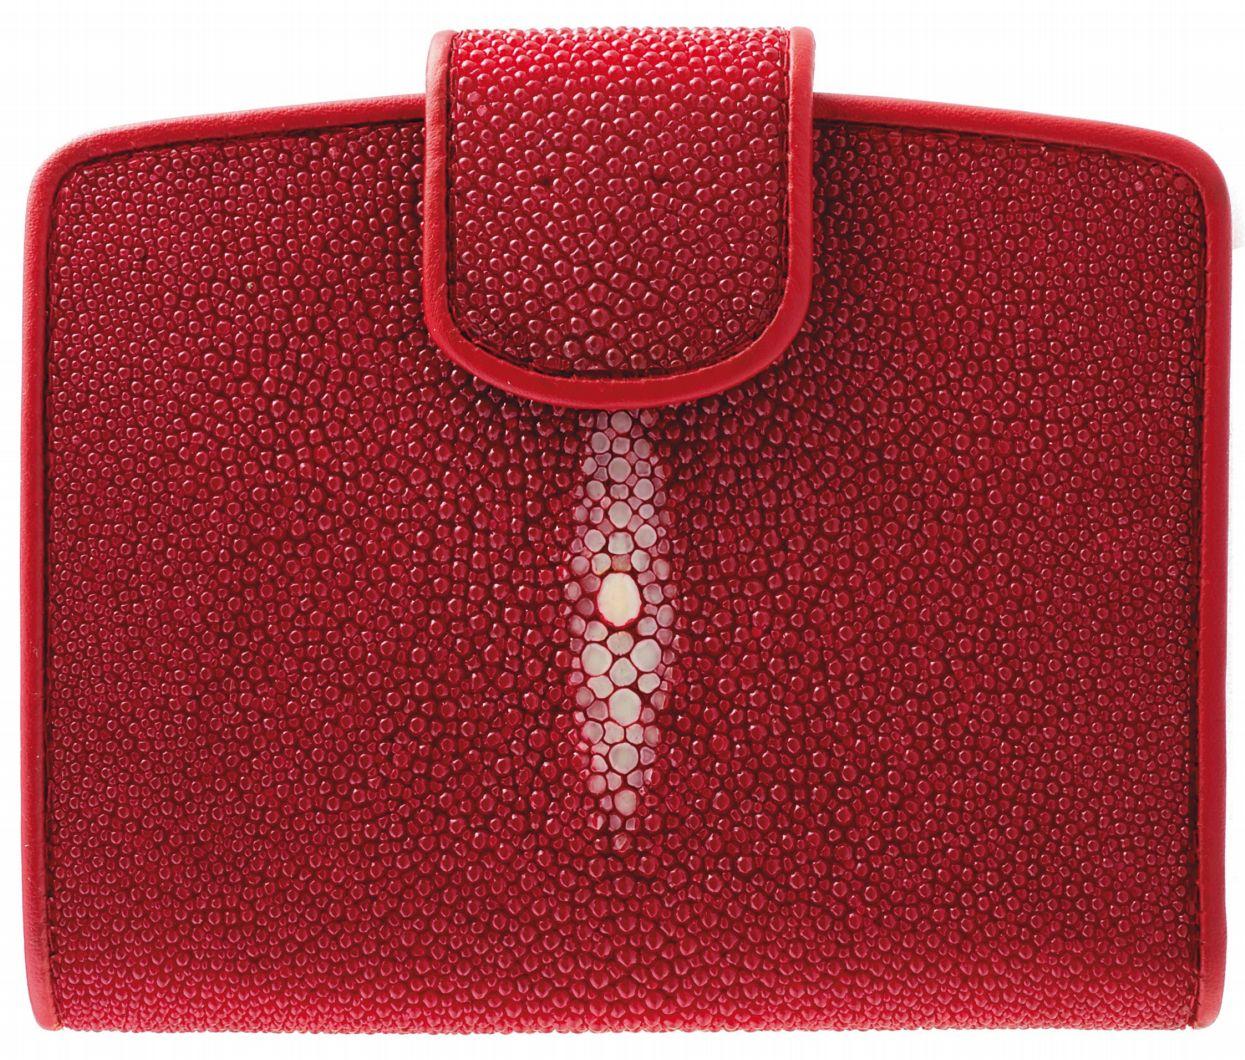 KRENIG portfel red